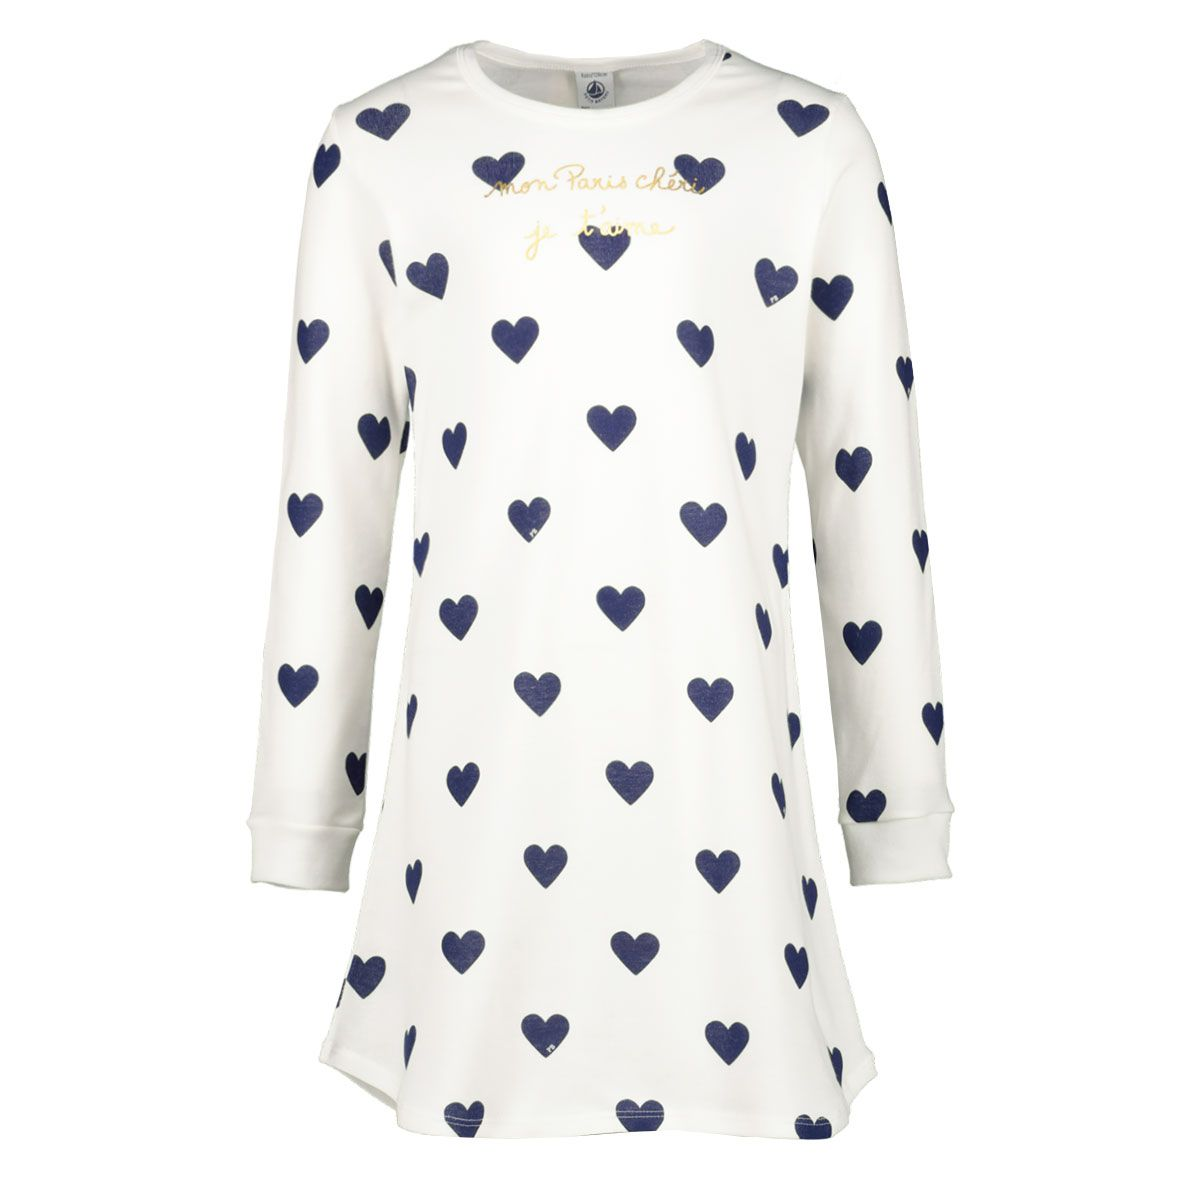 neu kaufen gutes Angebot gut aussehend Nachthemd Petit Bateau